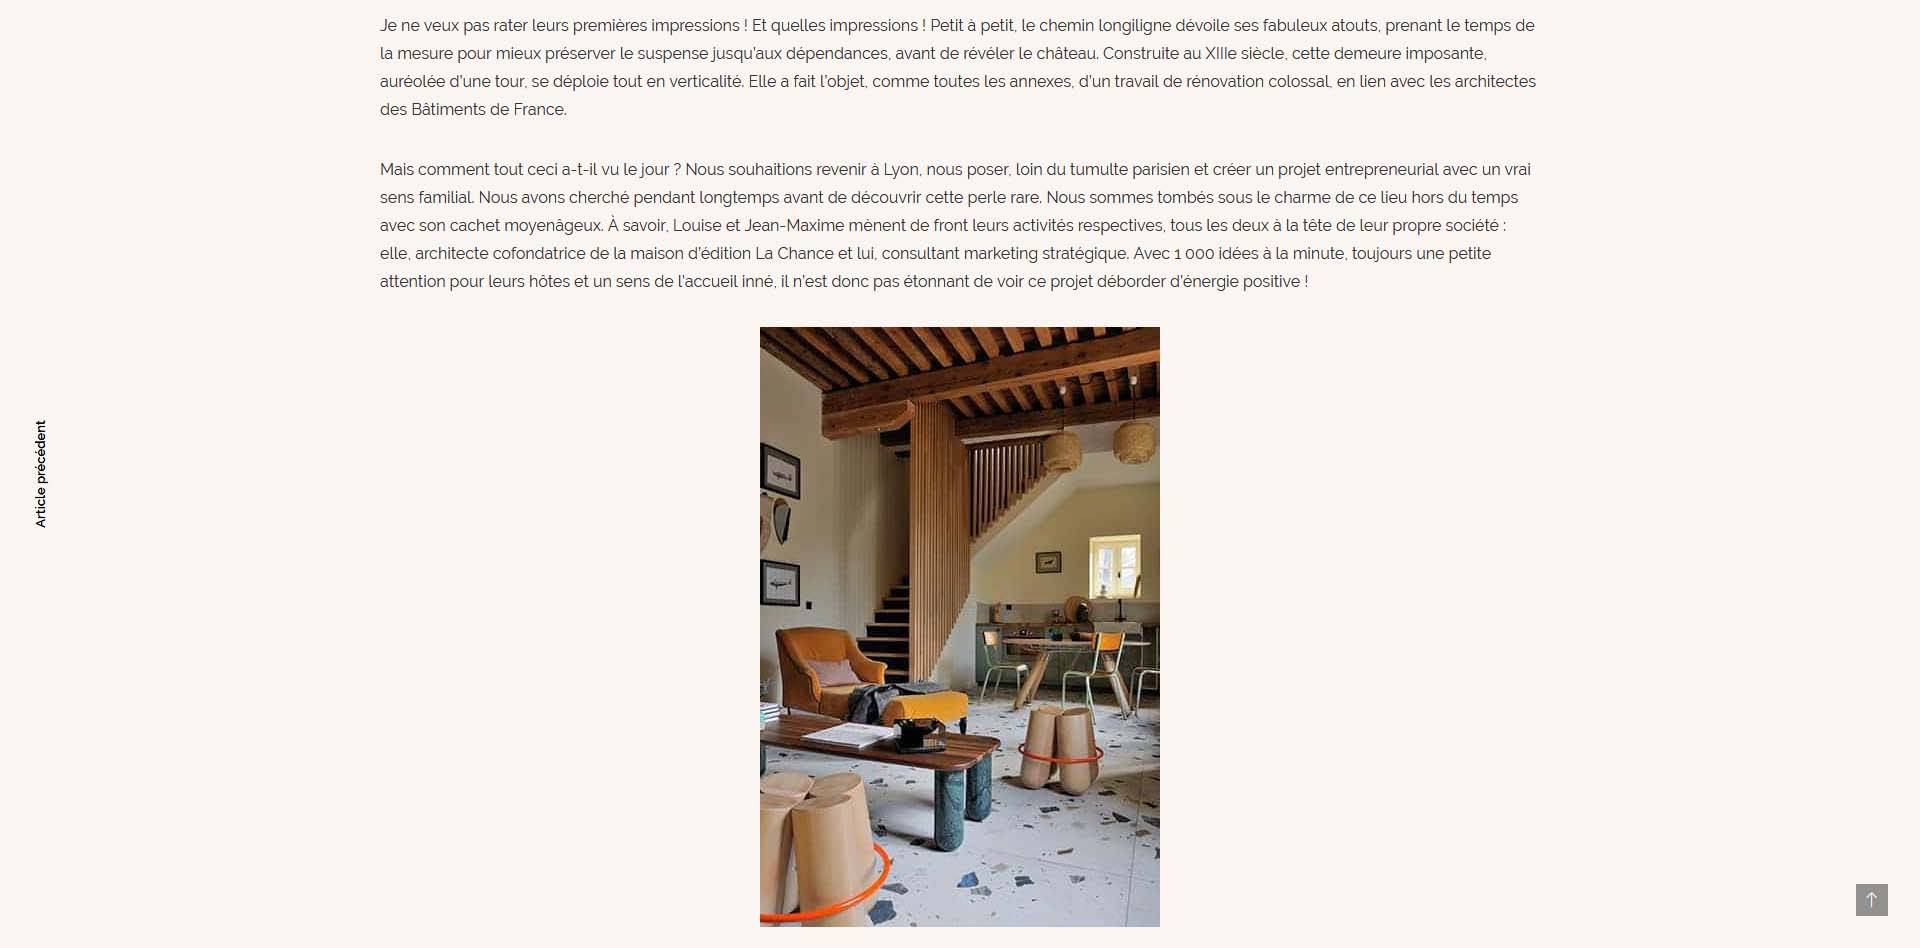 Capture-ecran-article-domodeco-juin-2020-3